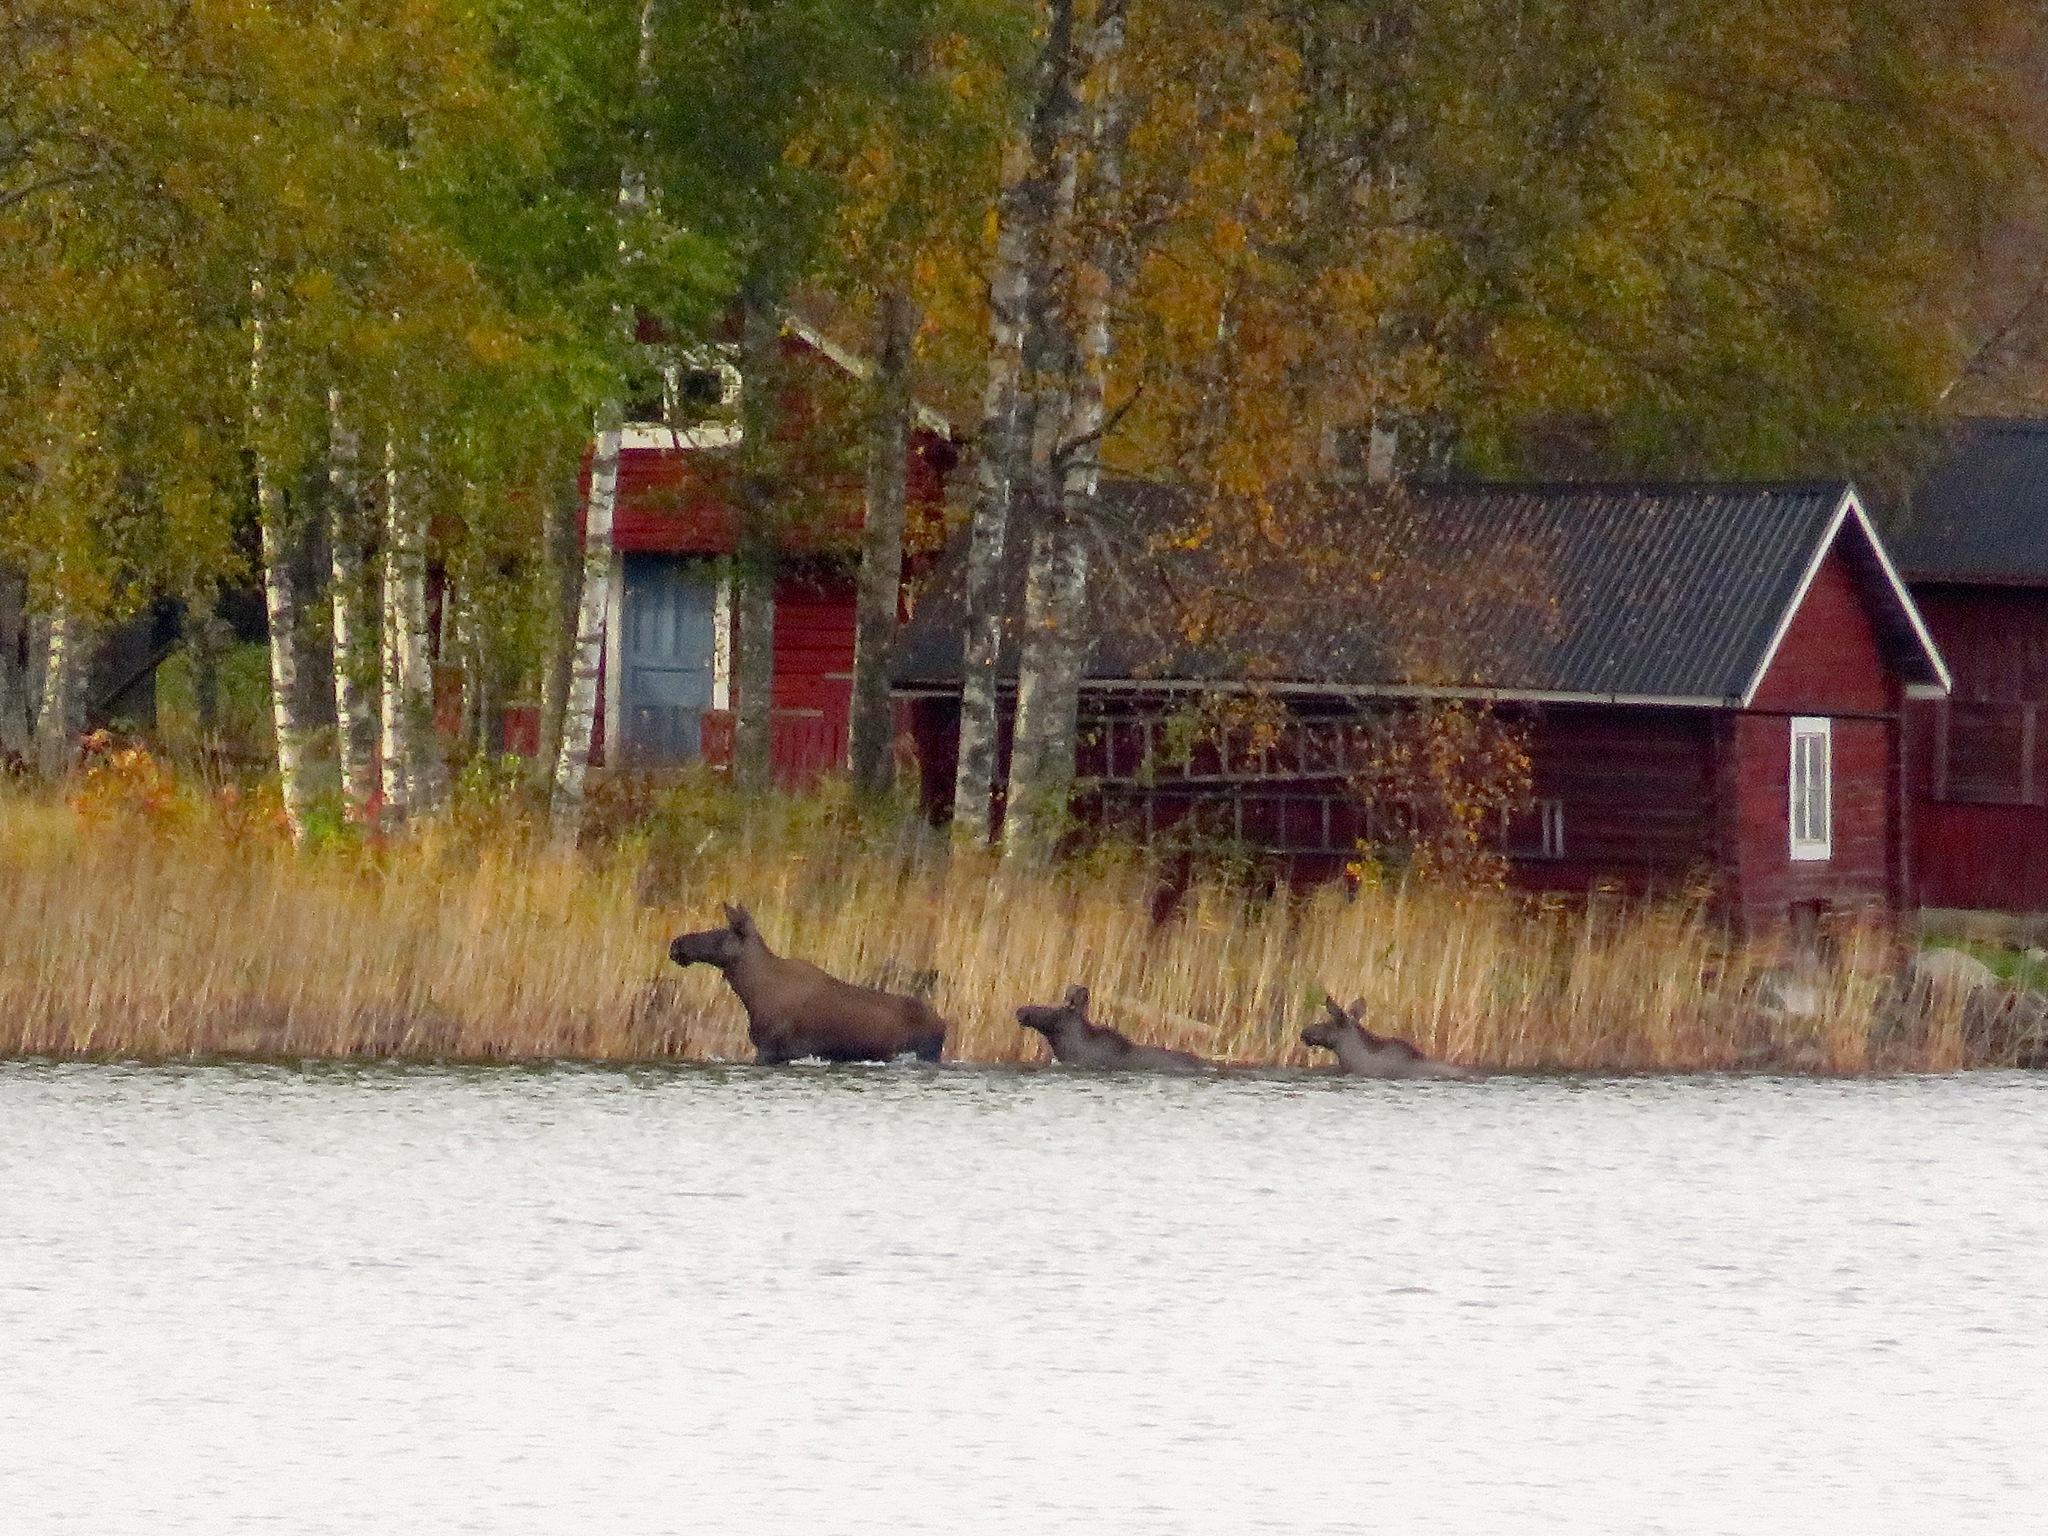 Swimming with mum  by Birgith Haraldsson